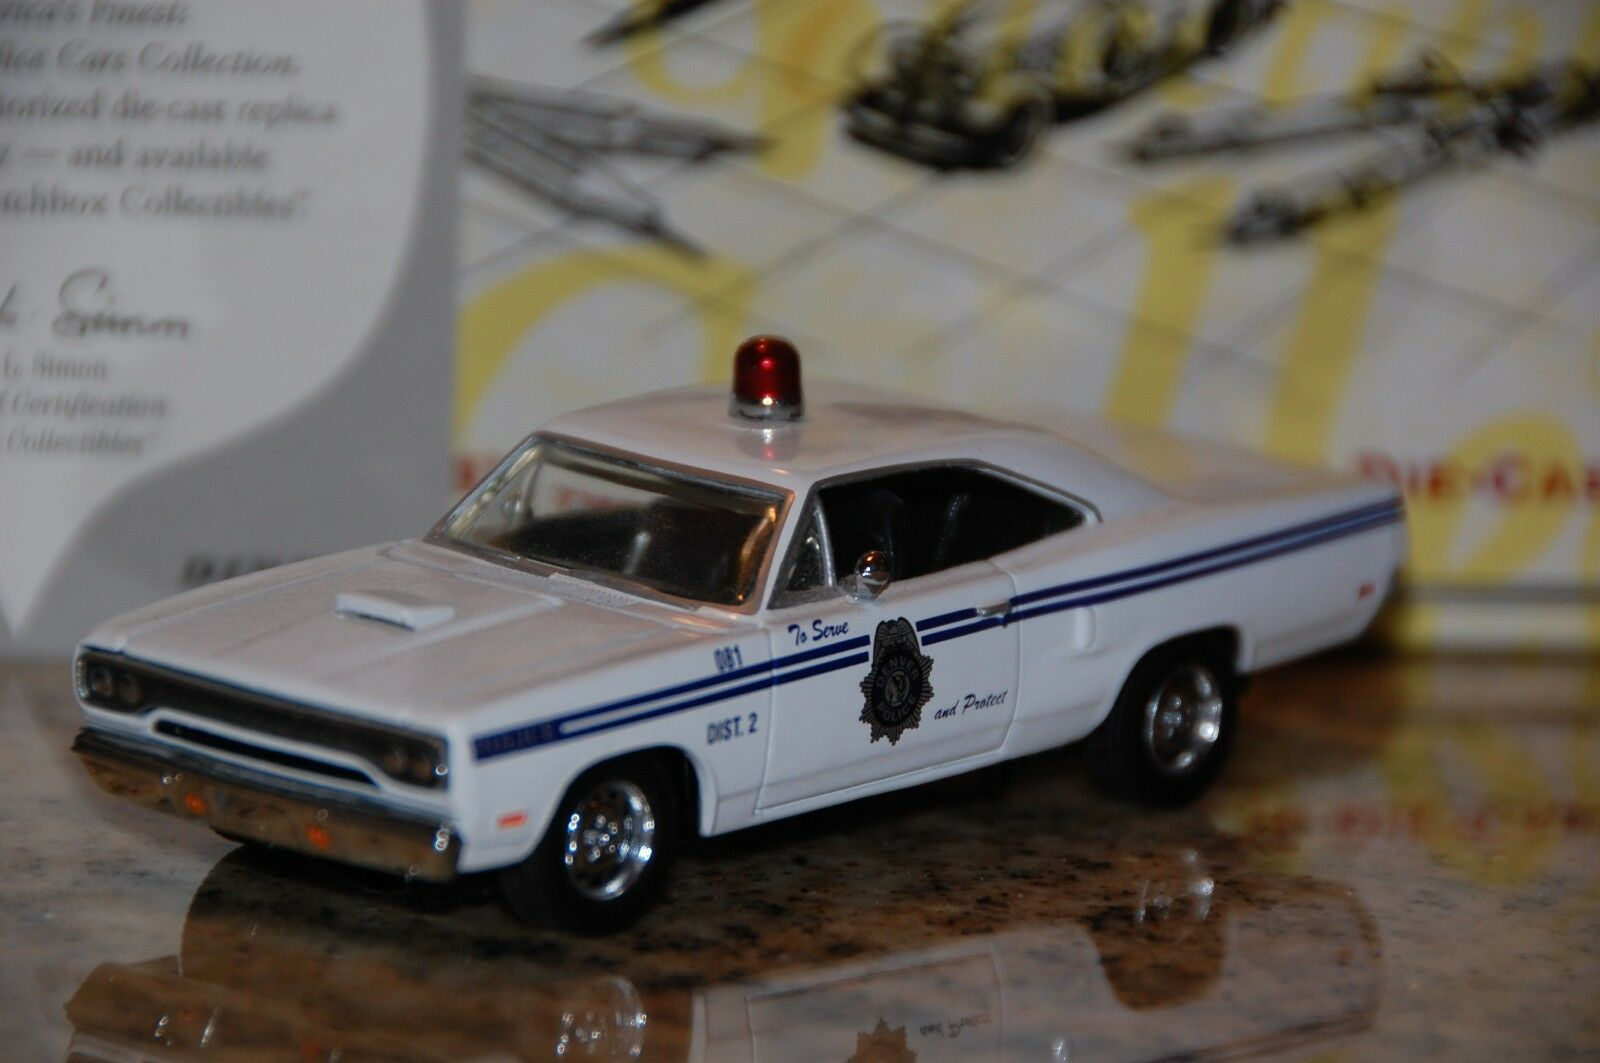 Matchbox Coll. 1970 Plymouth Road Runner Denver Co. Police Dept. DYM38022